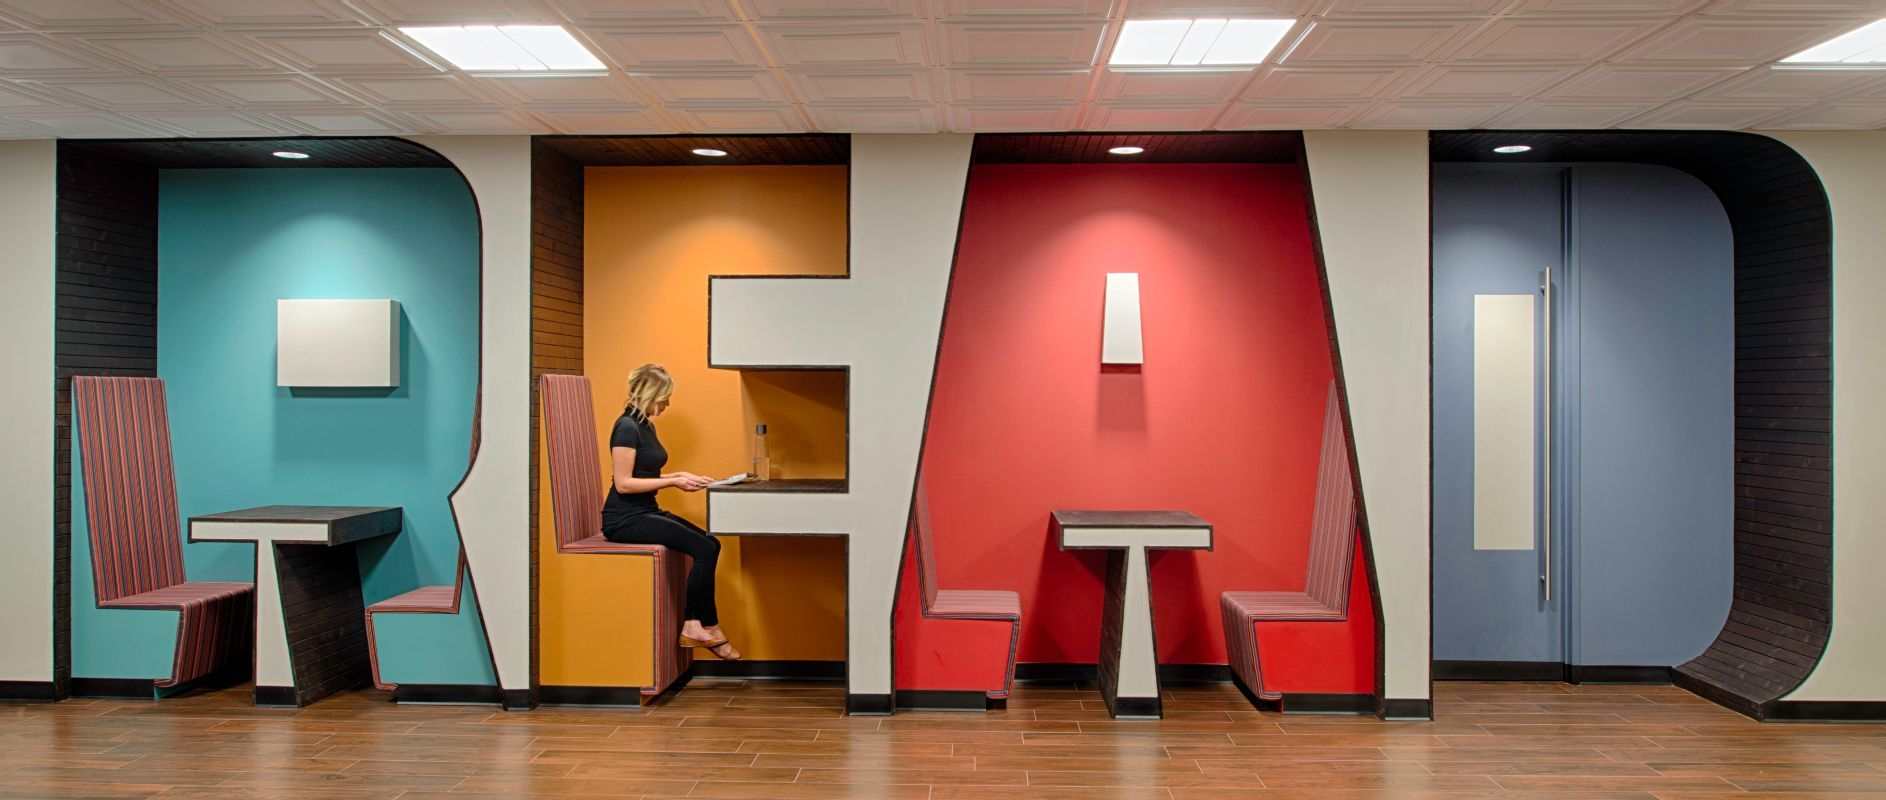 RetailMeNot Austin | Office interior